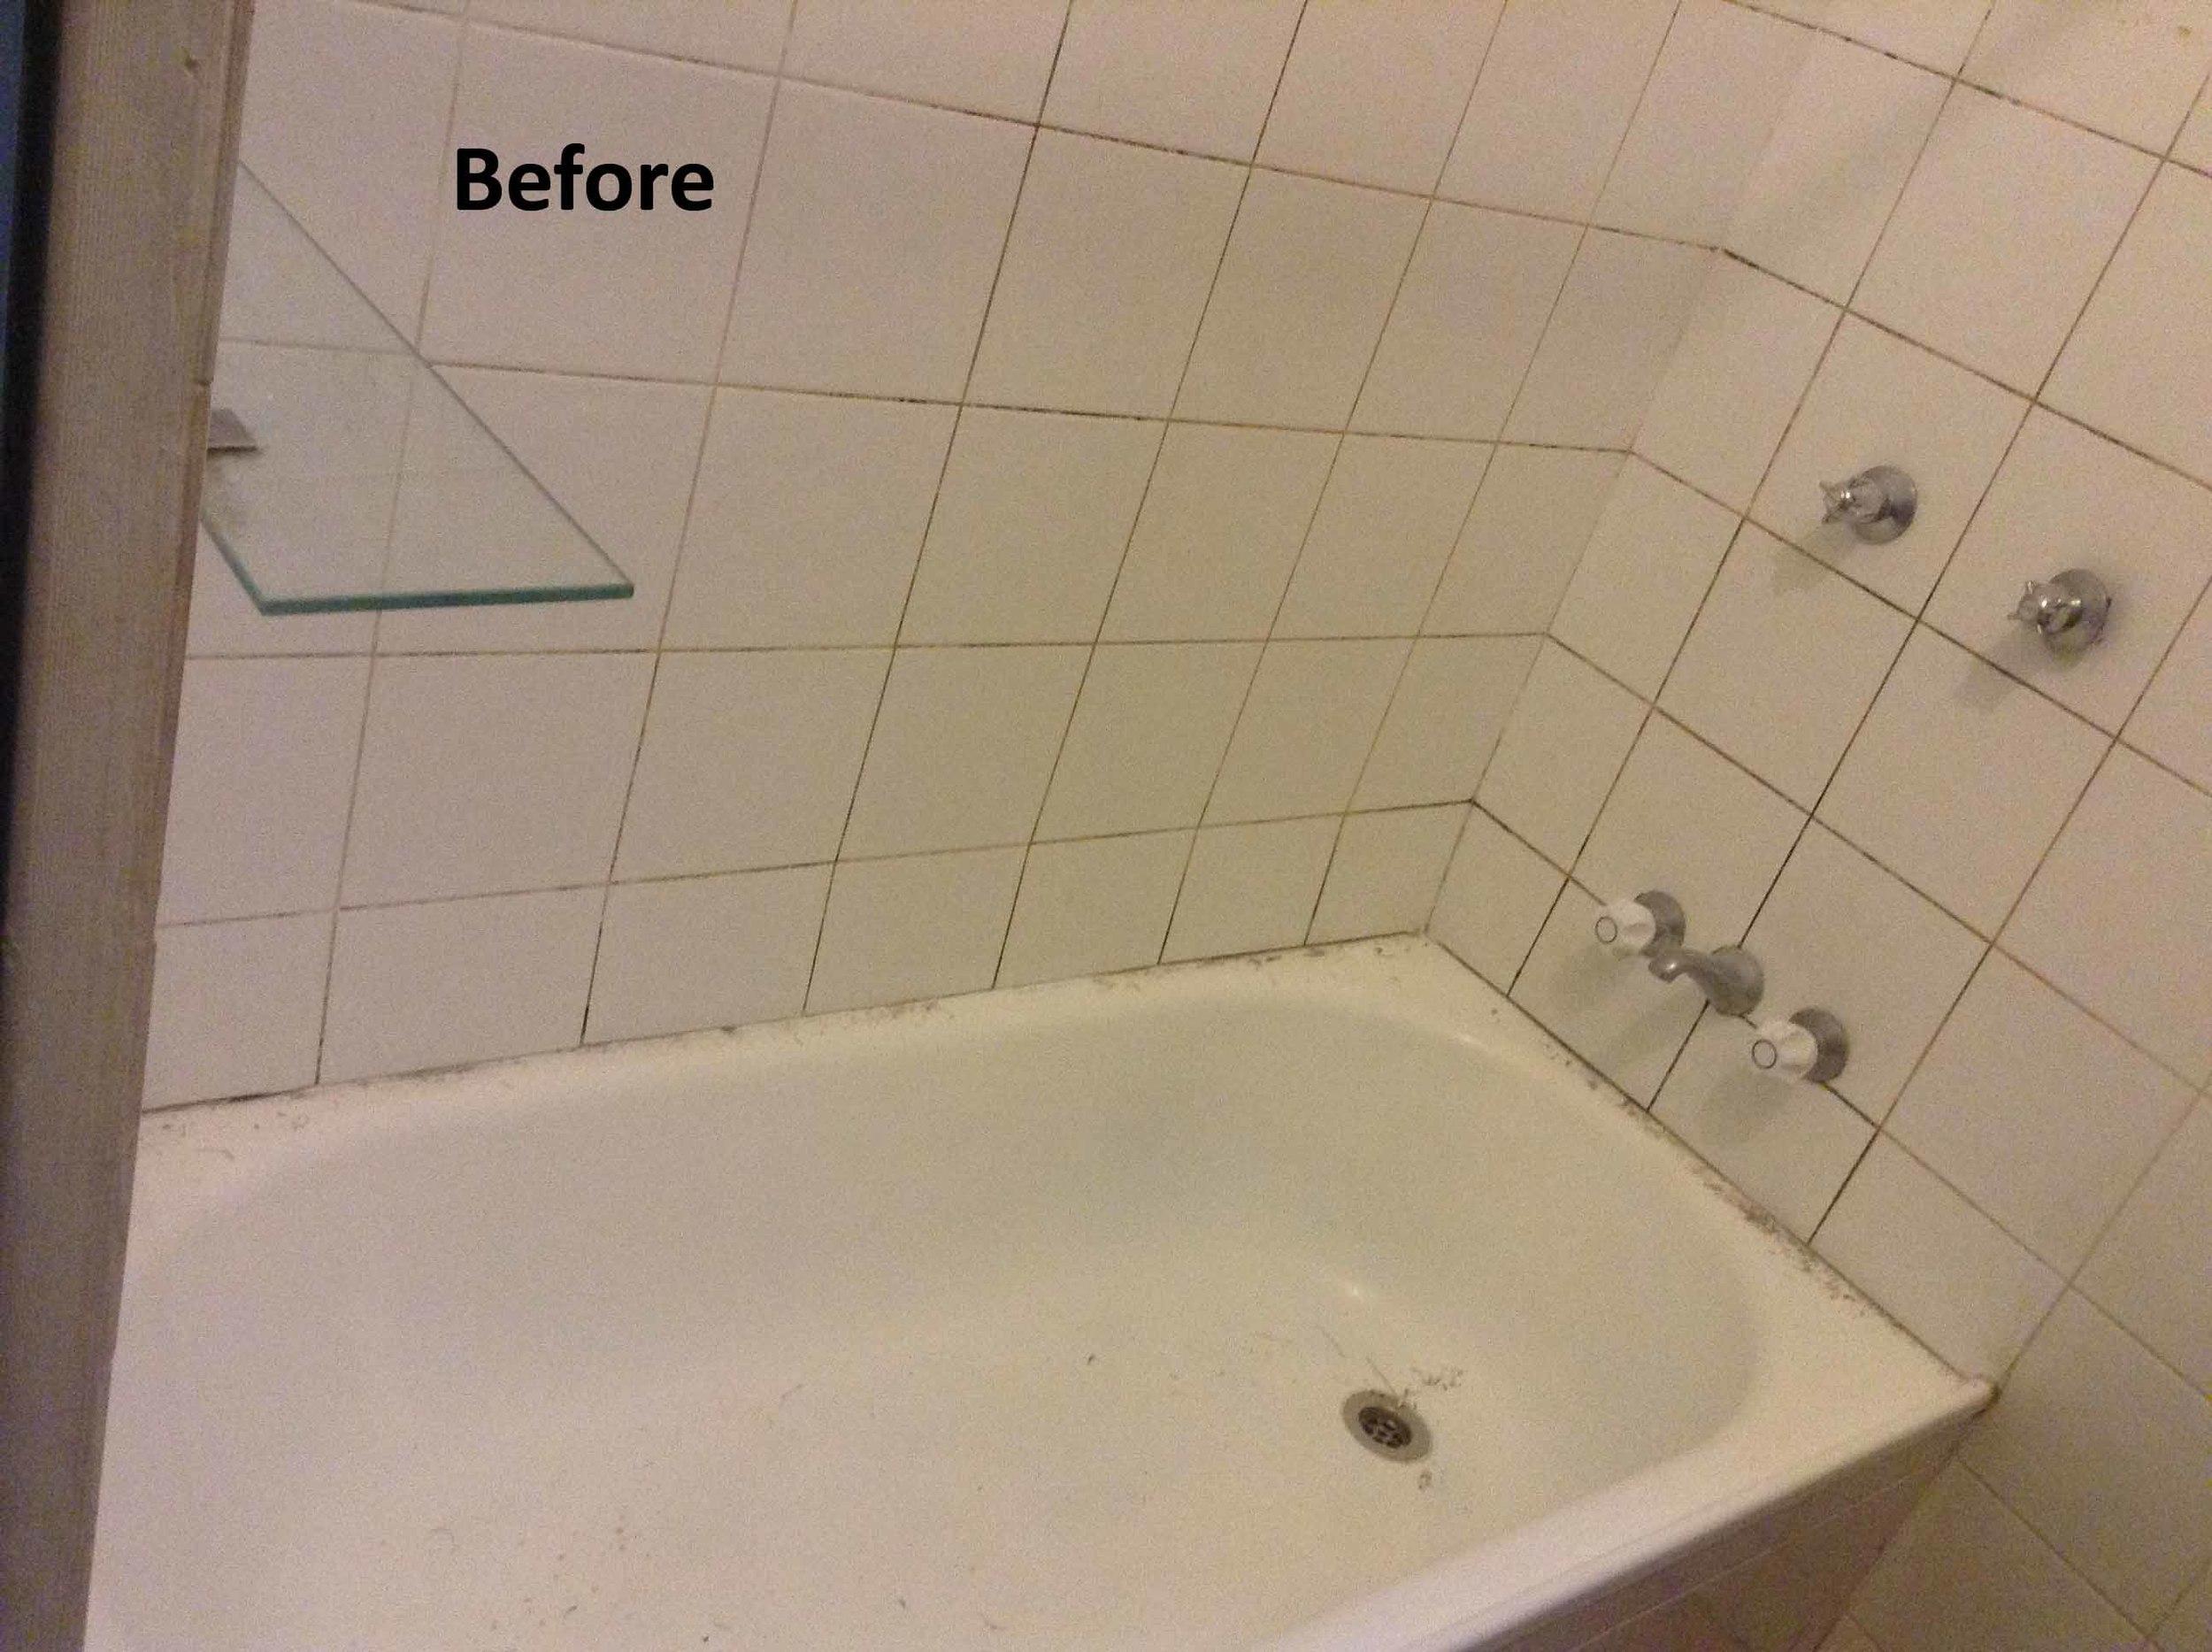 Leaking Shower Bath, Before shower repair.